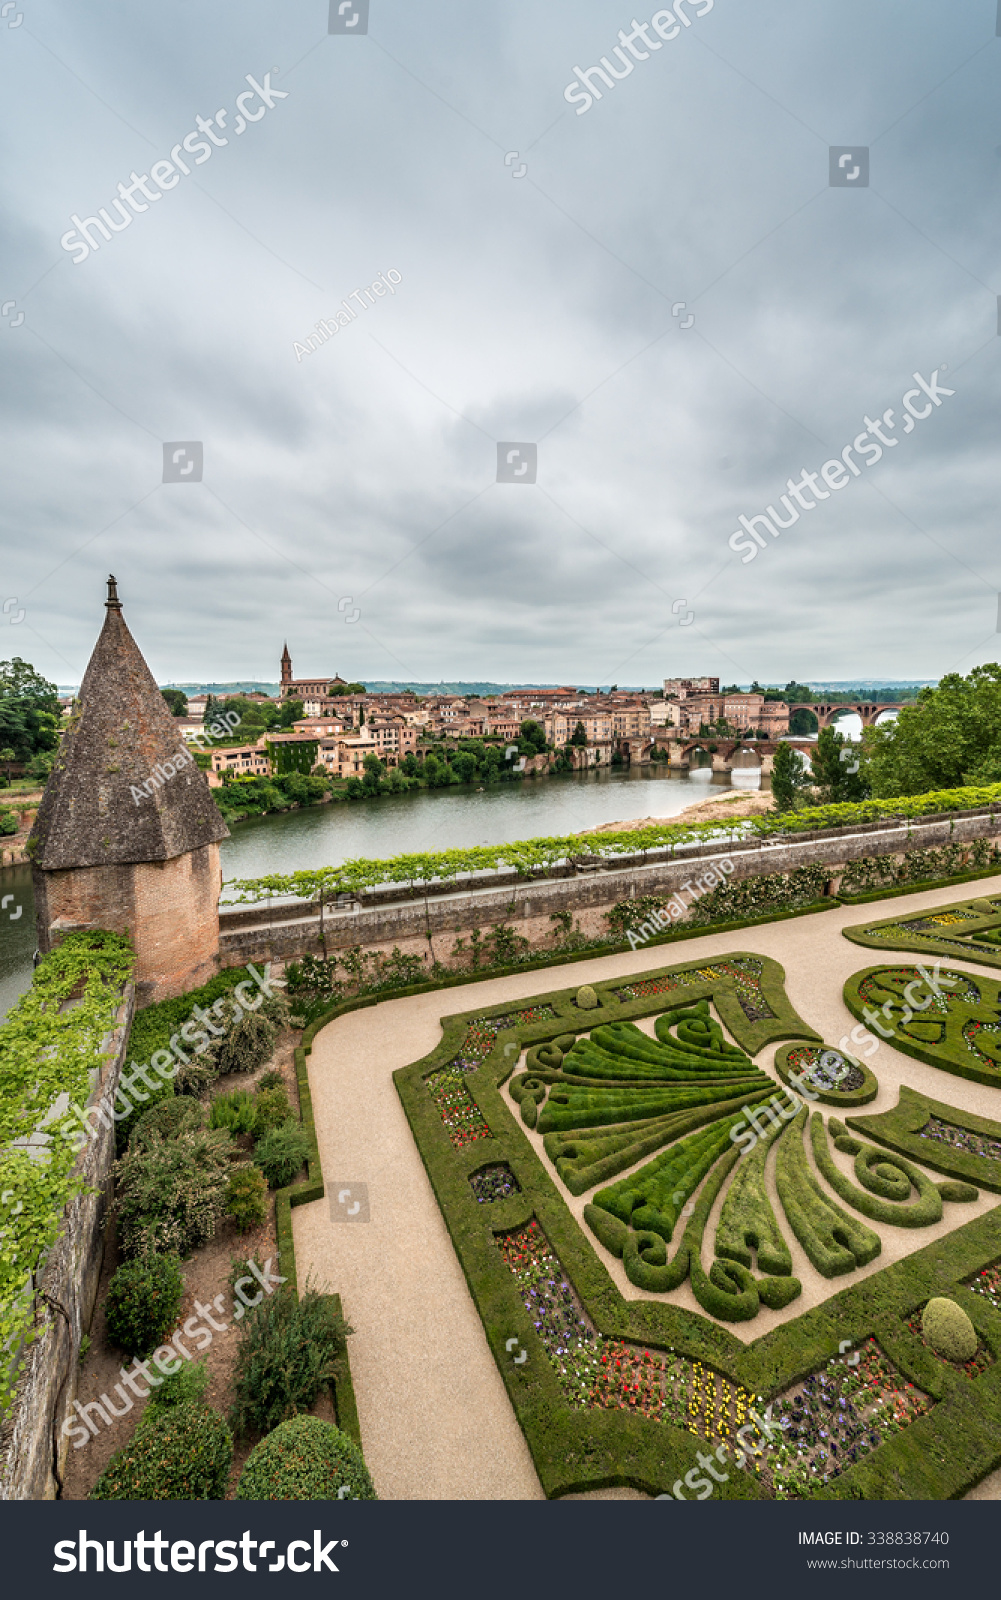 Architecte Paysagiste Midi Pyrénées photo de stock de palais de la berbie albi tarn (modifier